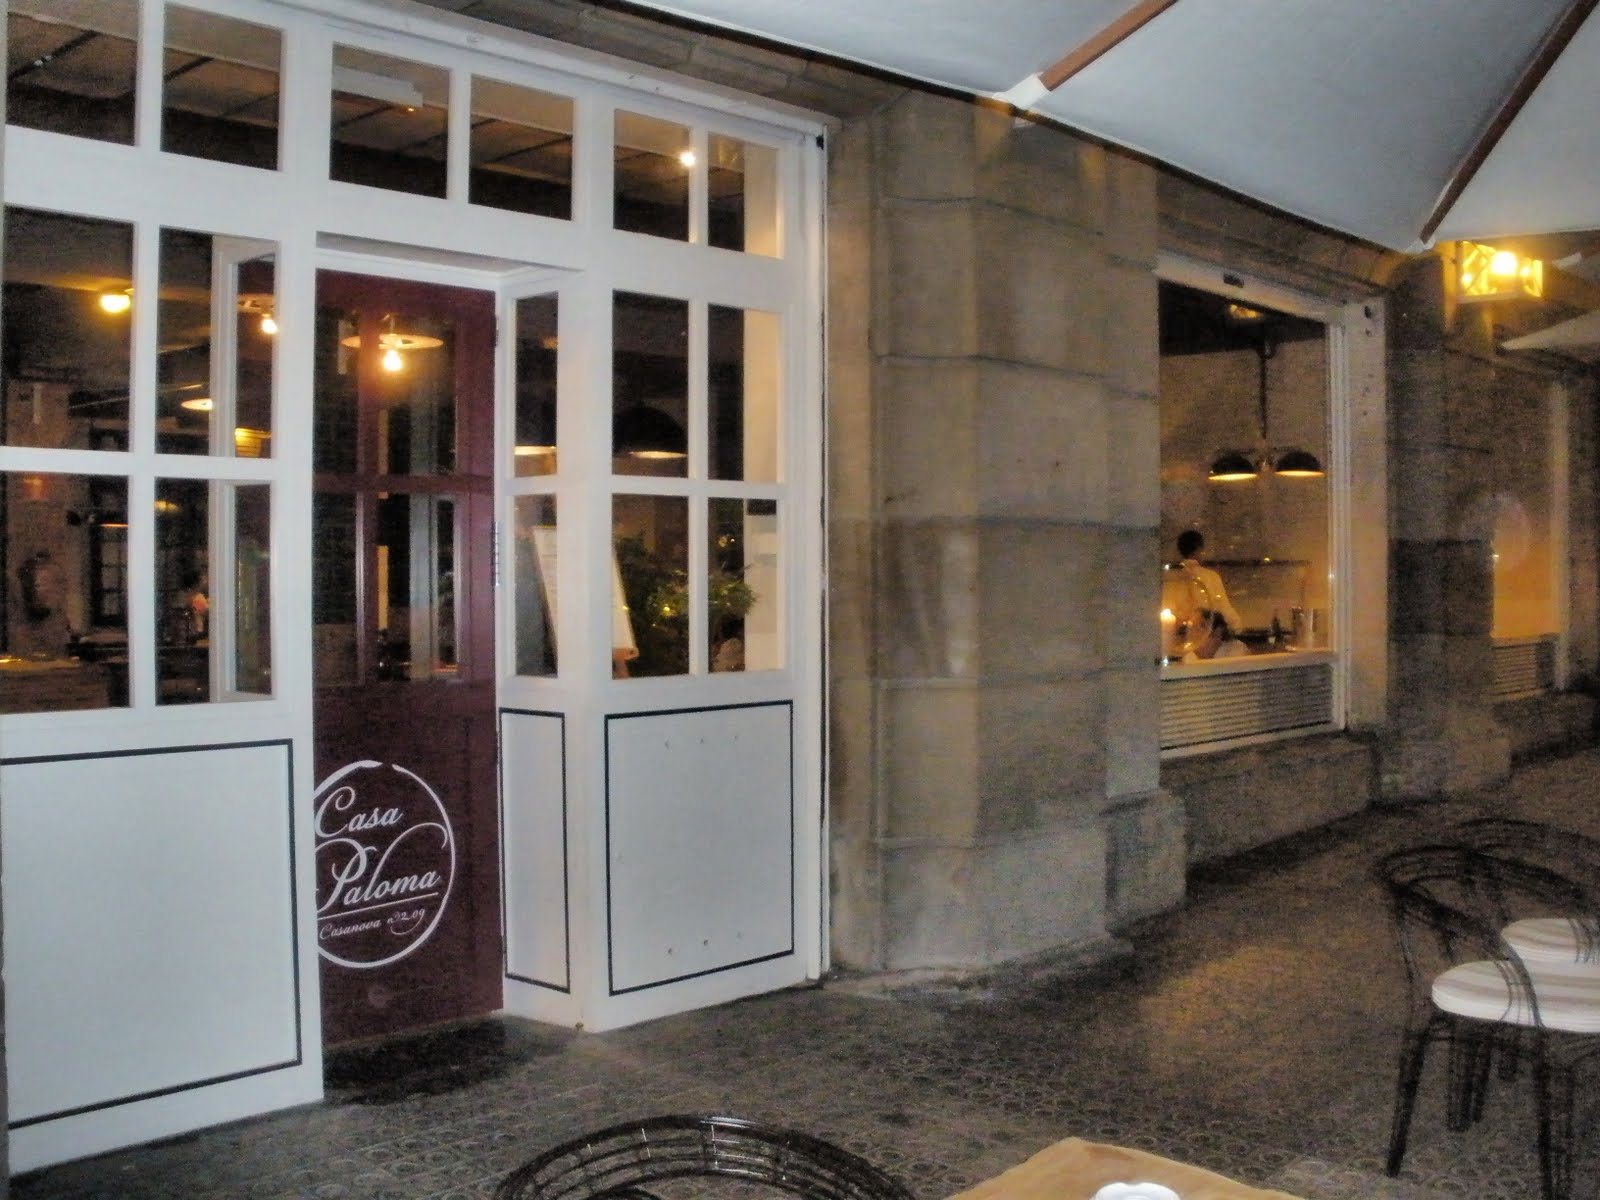 Observaci n gastron mica casa paloma barcelona - Restaurante casa paloma barcelona ...